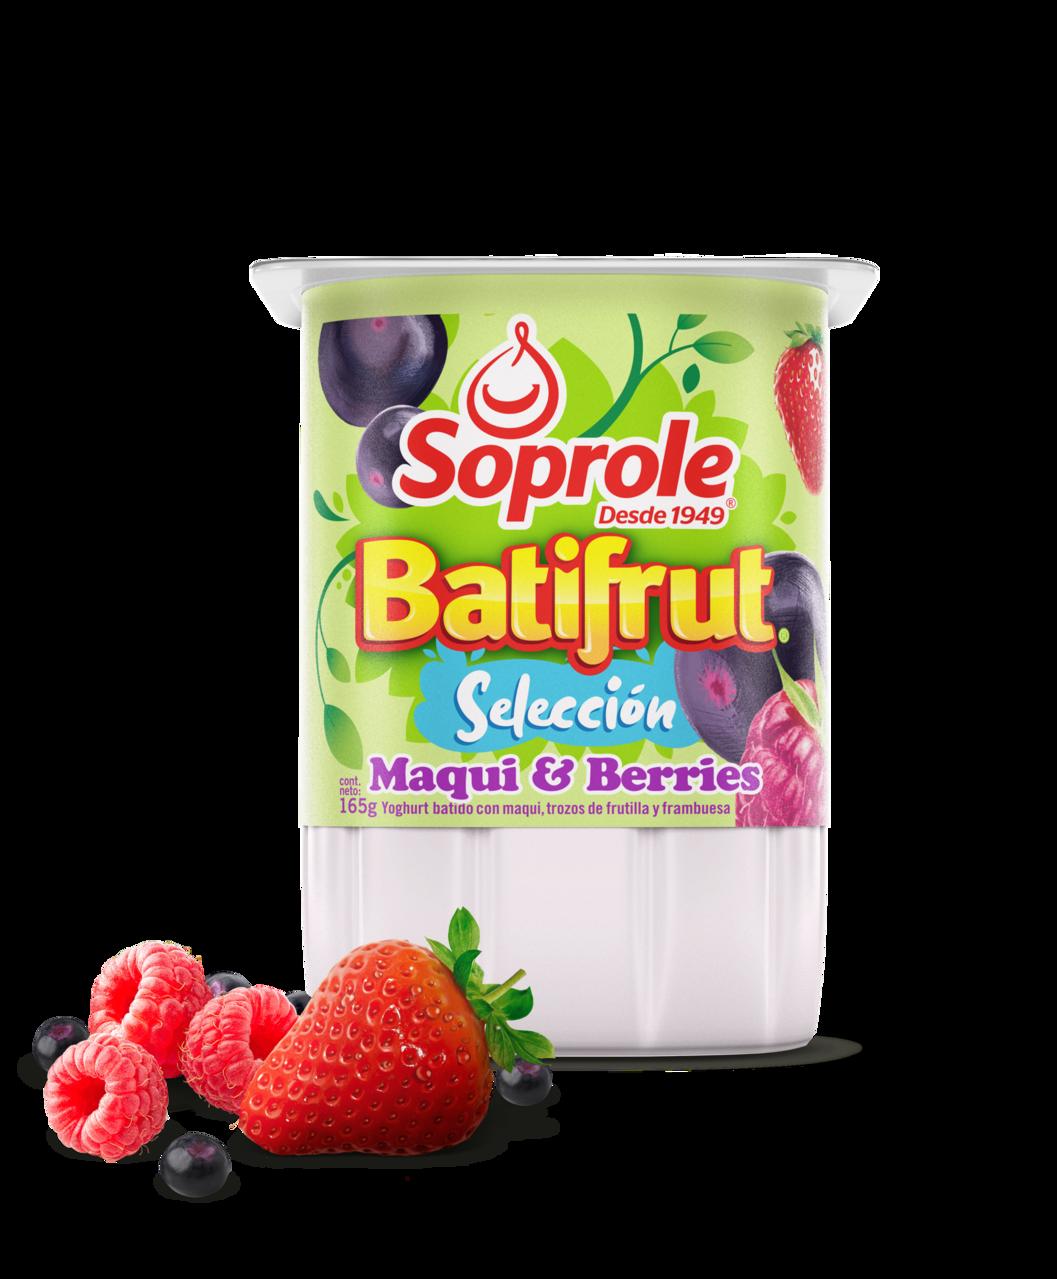 Soprole Yoghurt Batifrut Selección Maqui & Berries 165